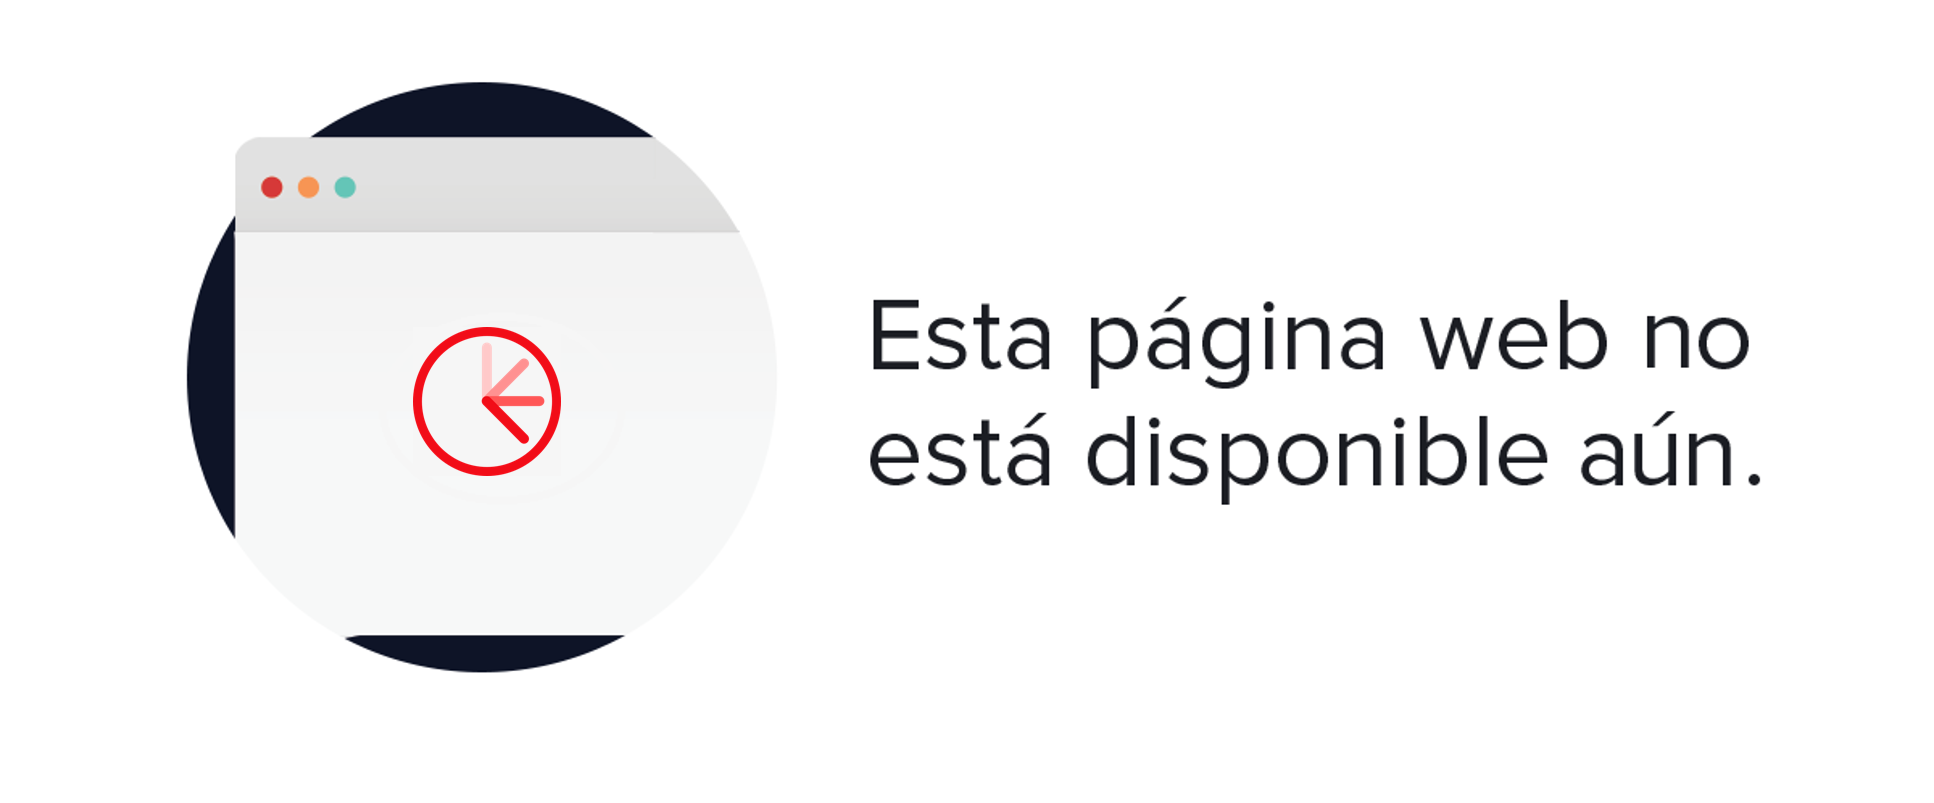 Bolsas de Papel Personalizadas con Asa Rizada Medidas 44+15x49 cm 120gr